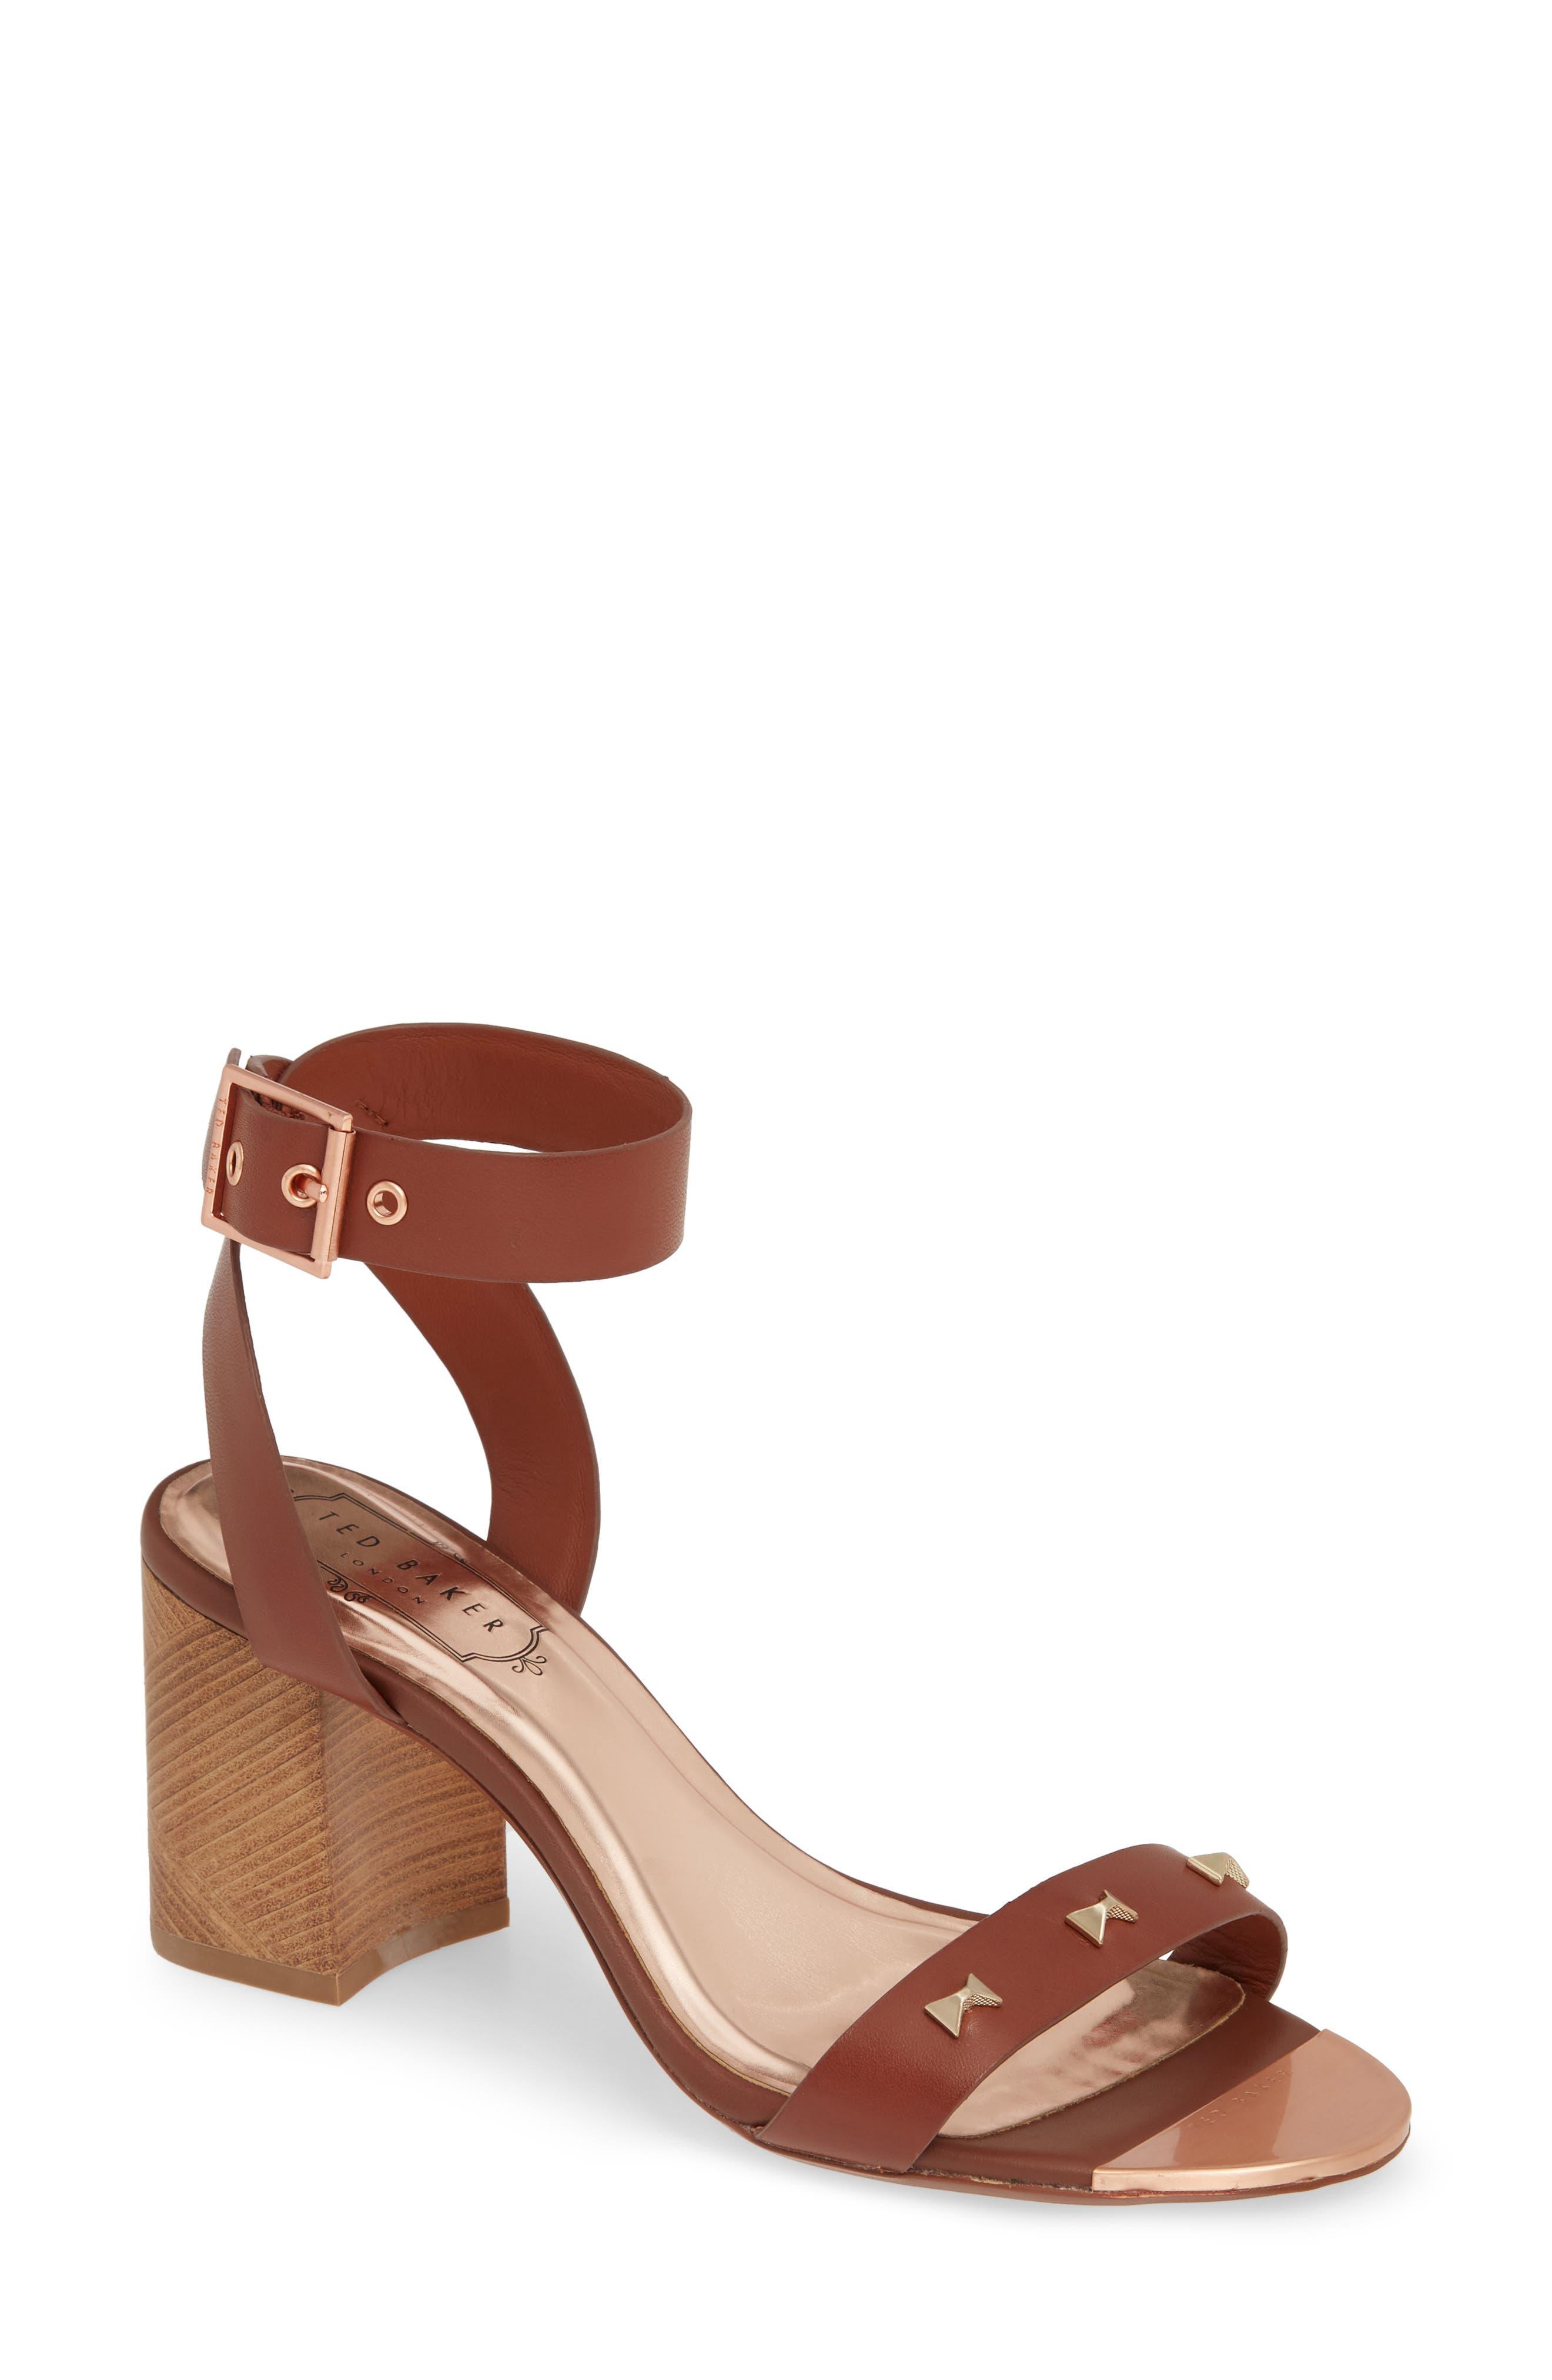 802faf28c Women s Ted Baker London Sandals